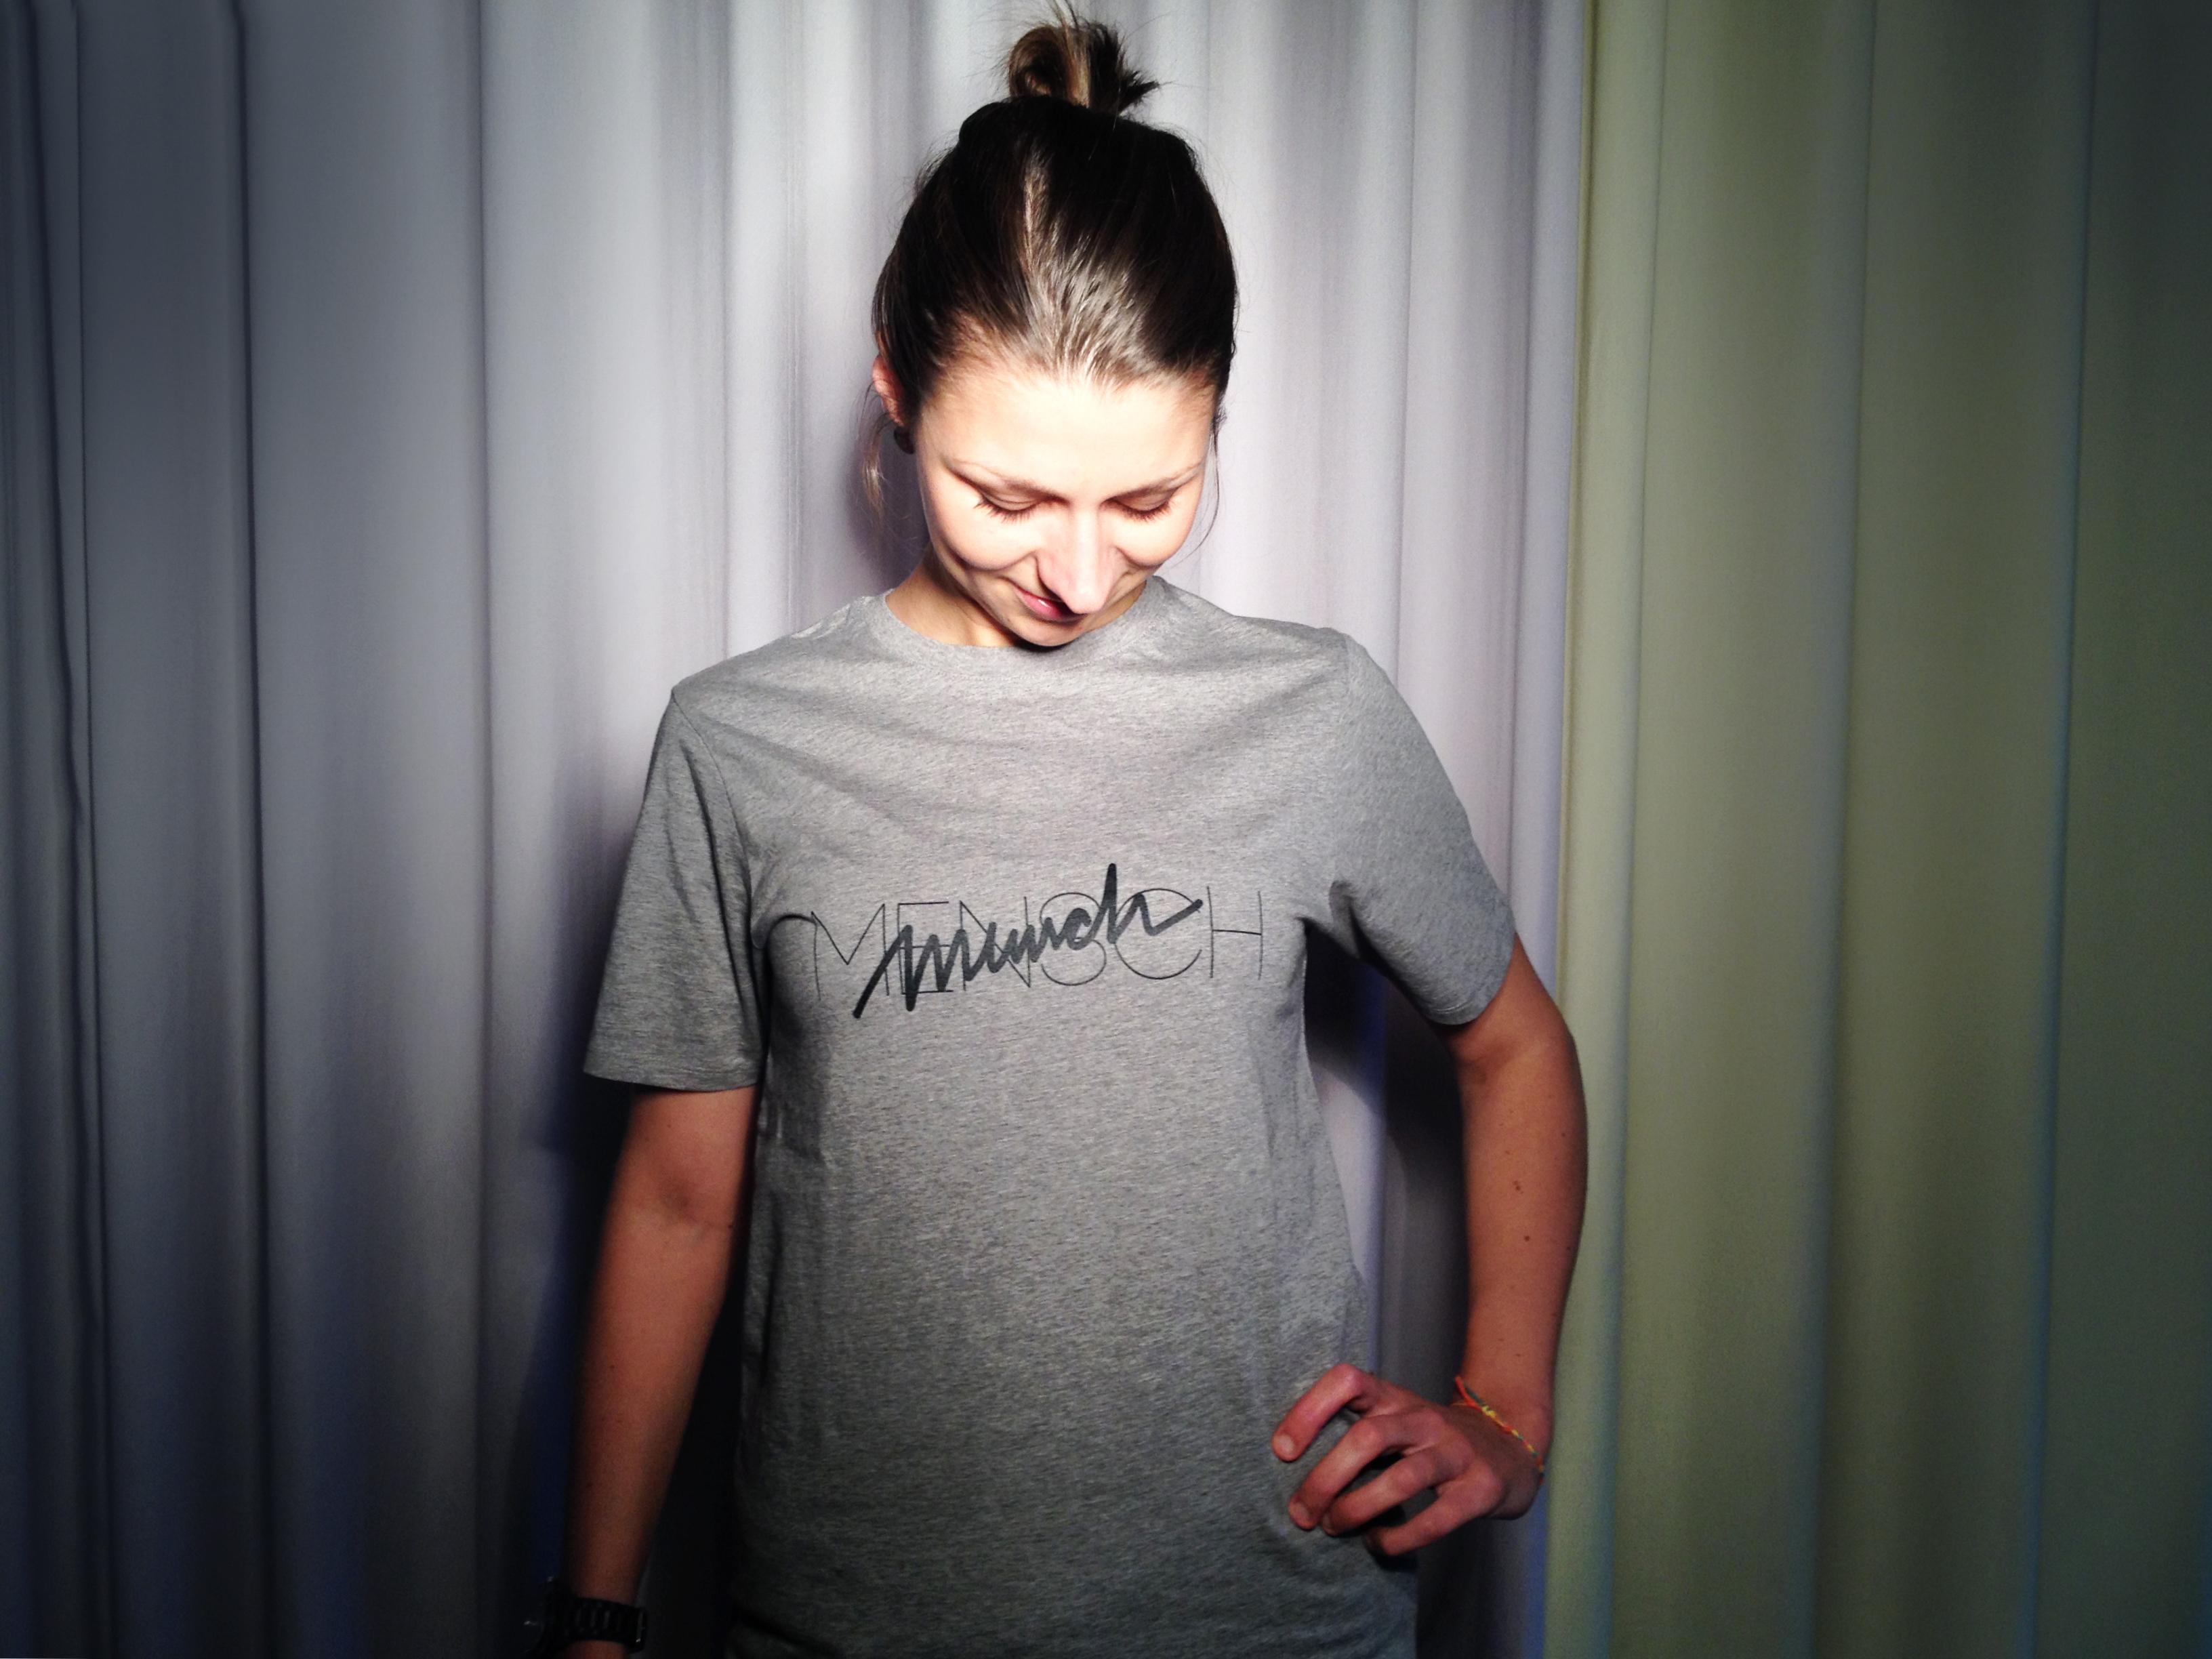 renk-magazin_mensch